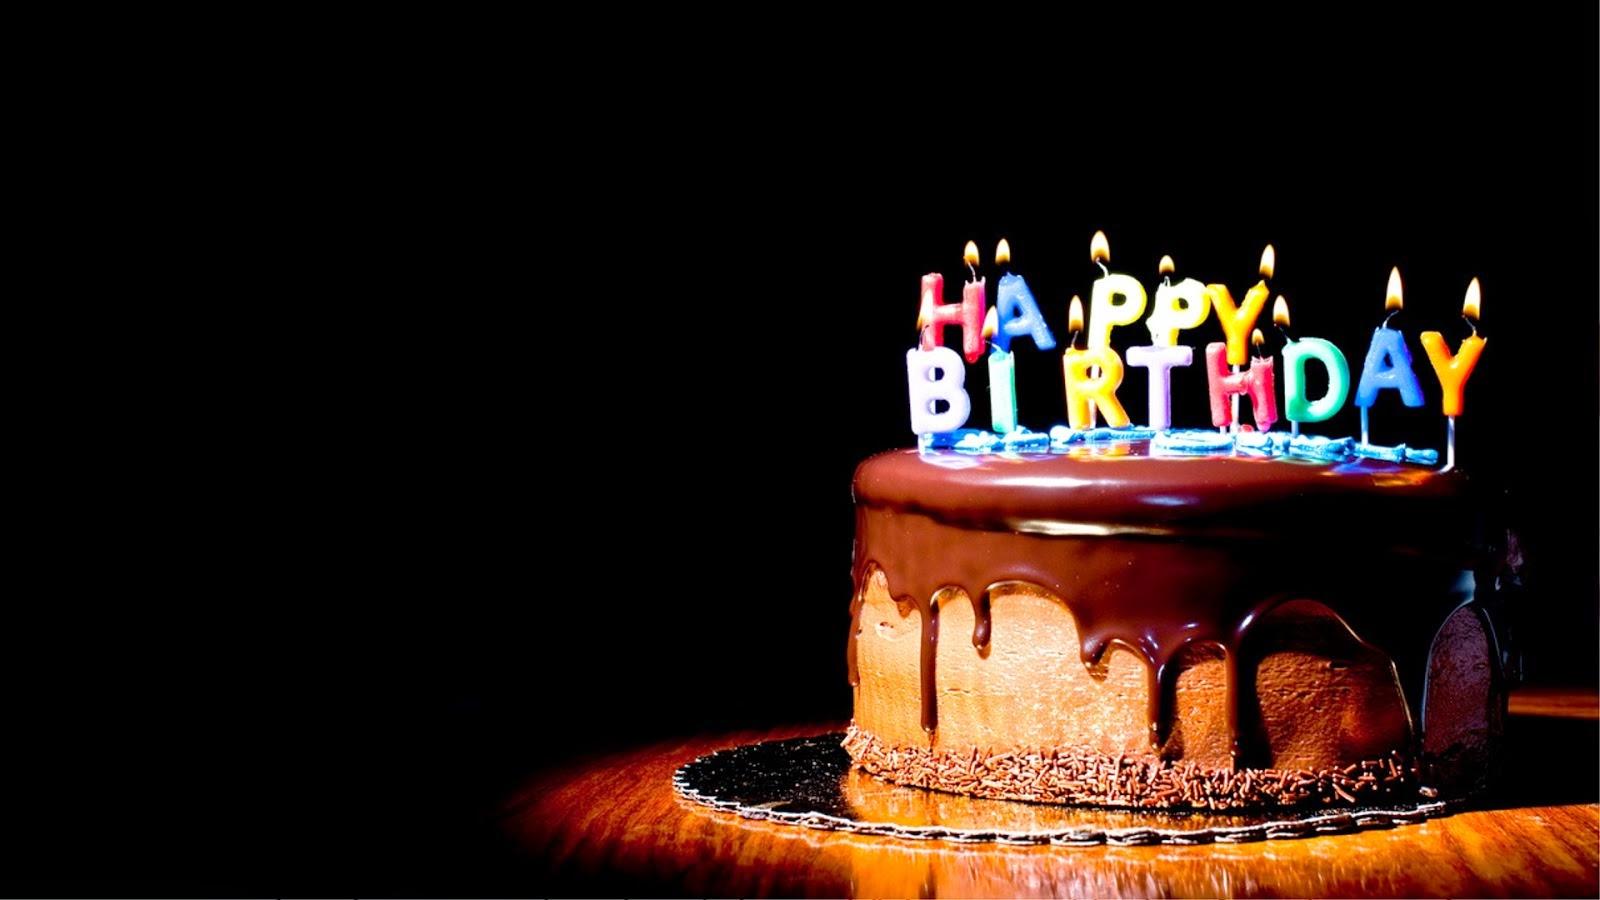 Wallpaper Happy Birthday Selamat Ulang Tahun 1600x900